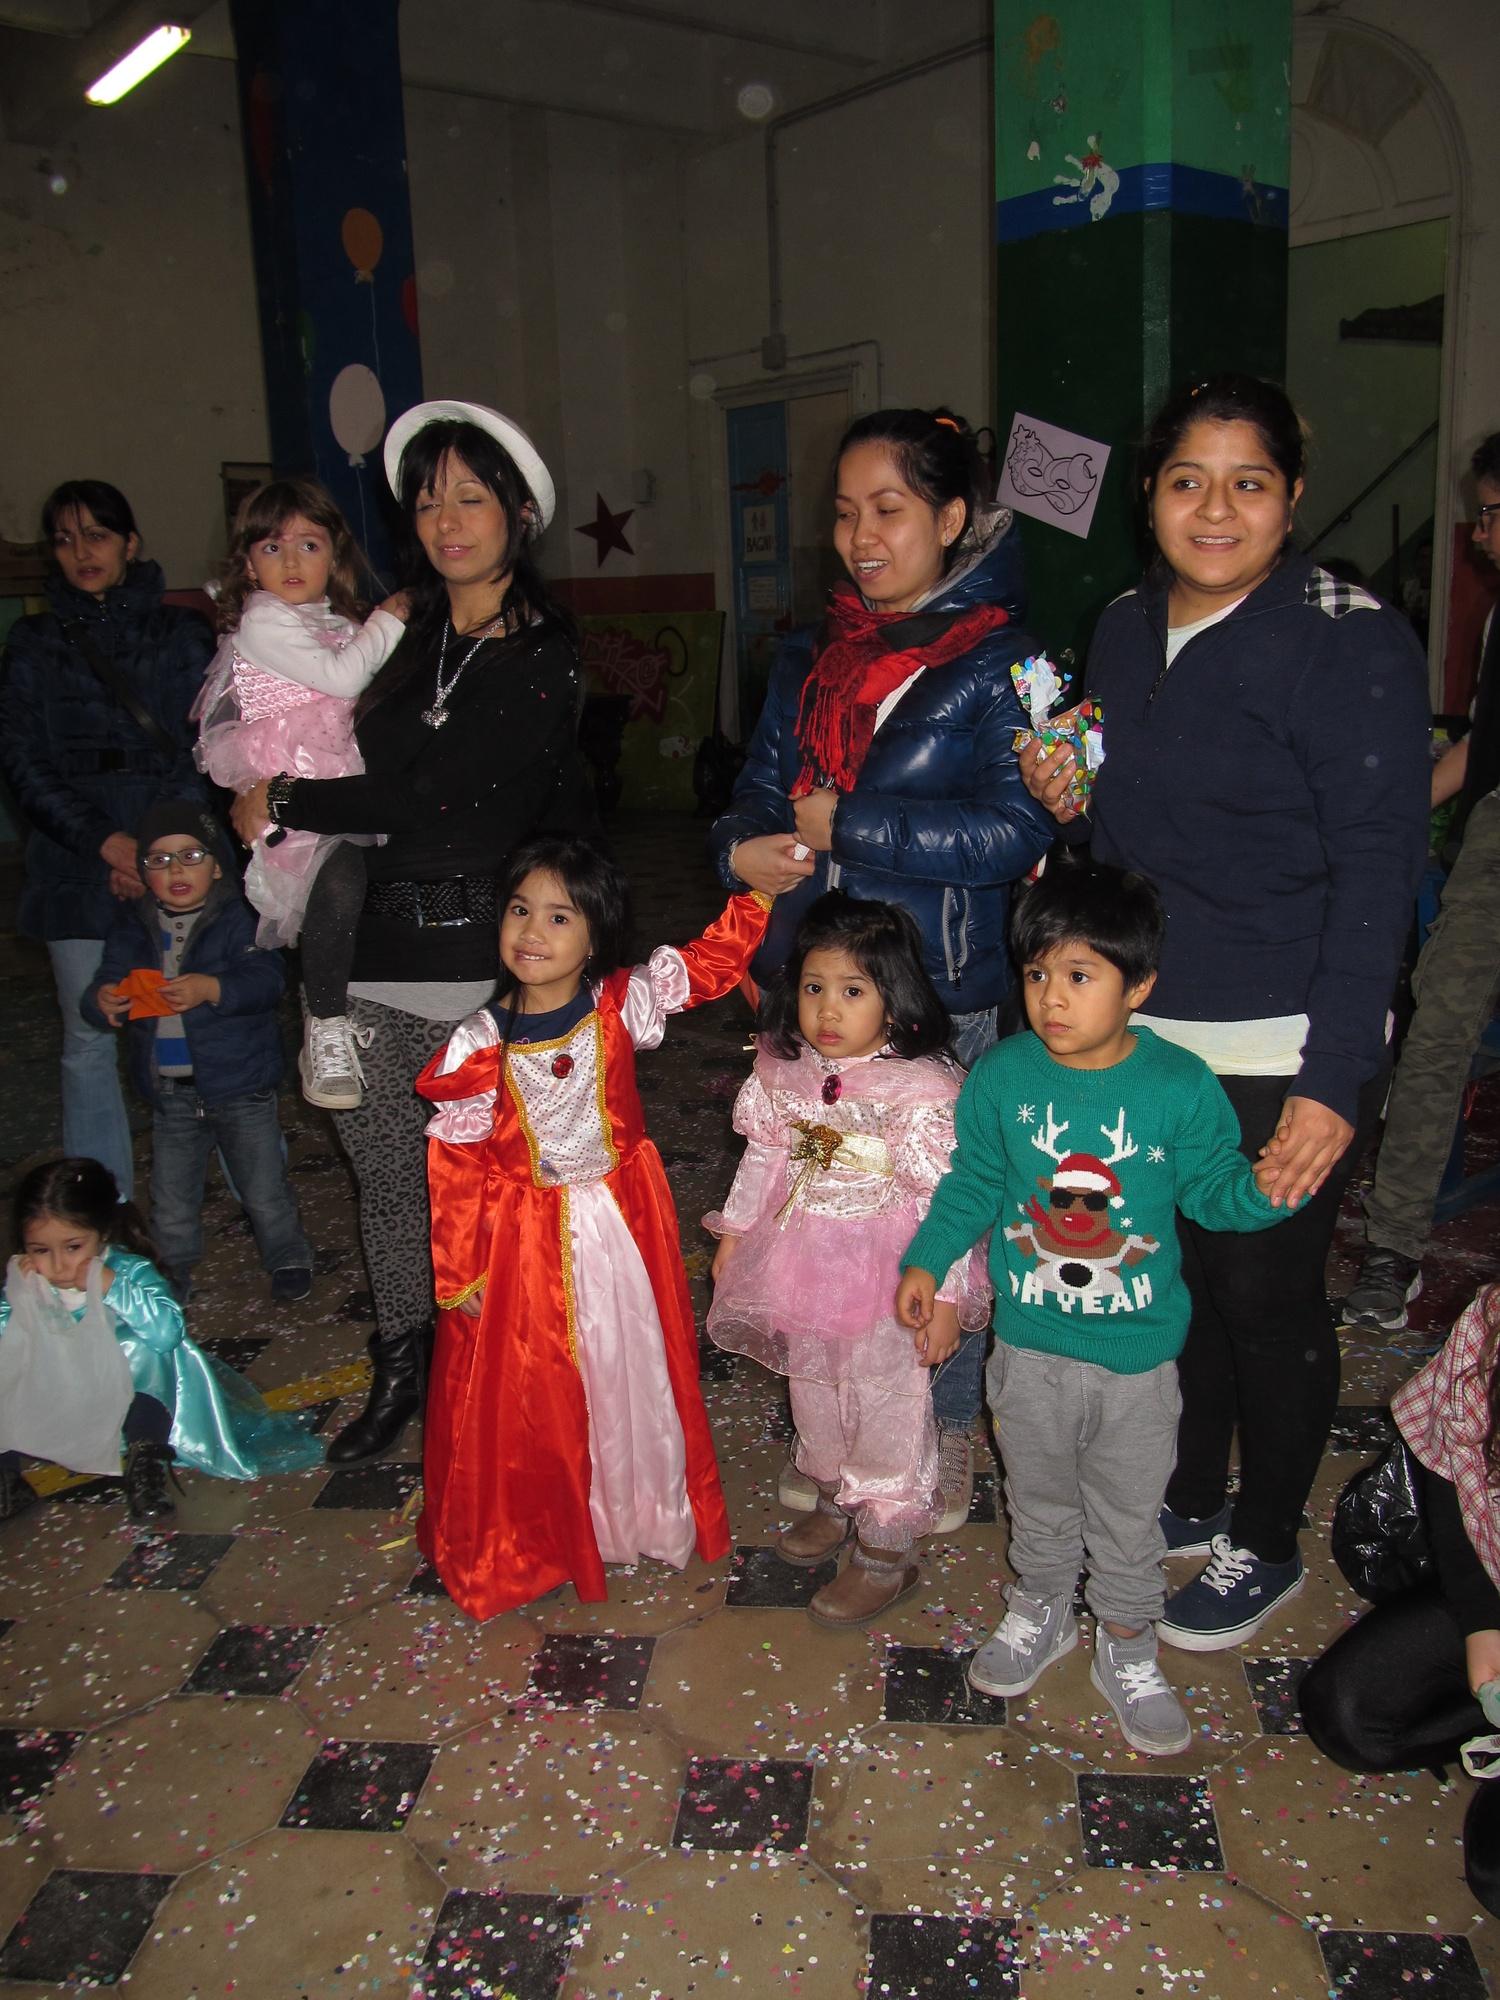 carnevale-pentolaccia-2016-02-13-16-36-40